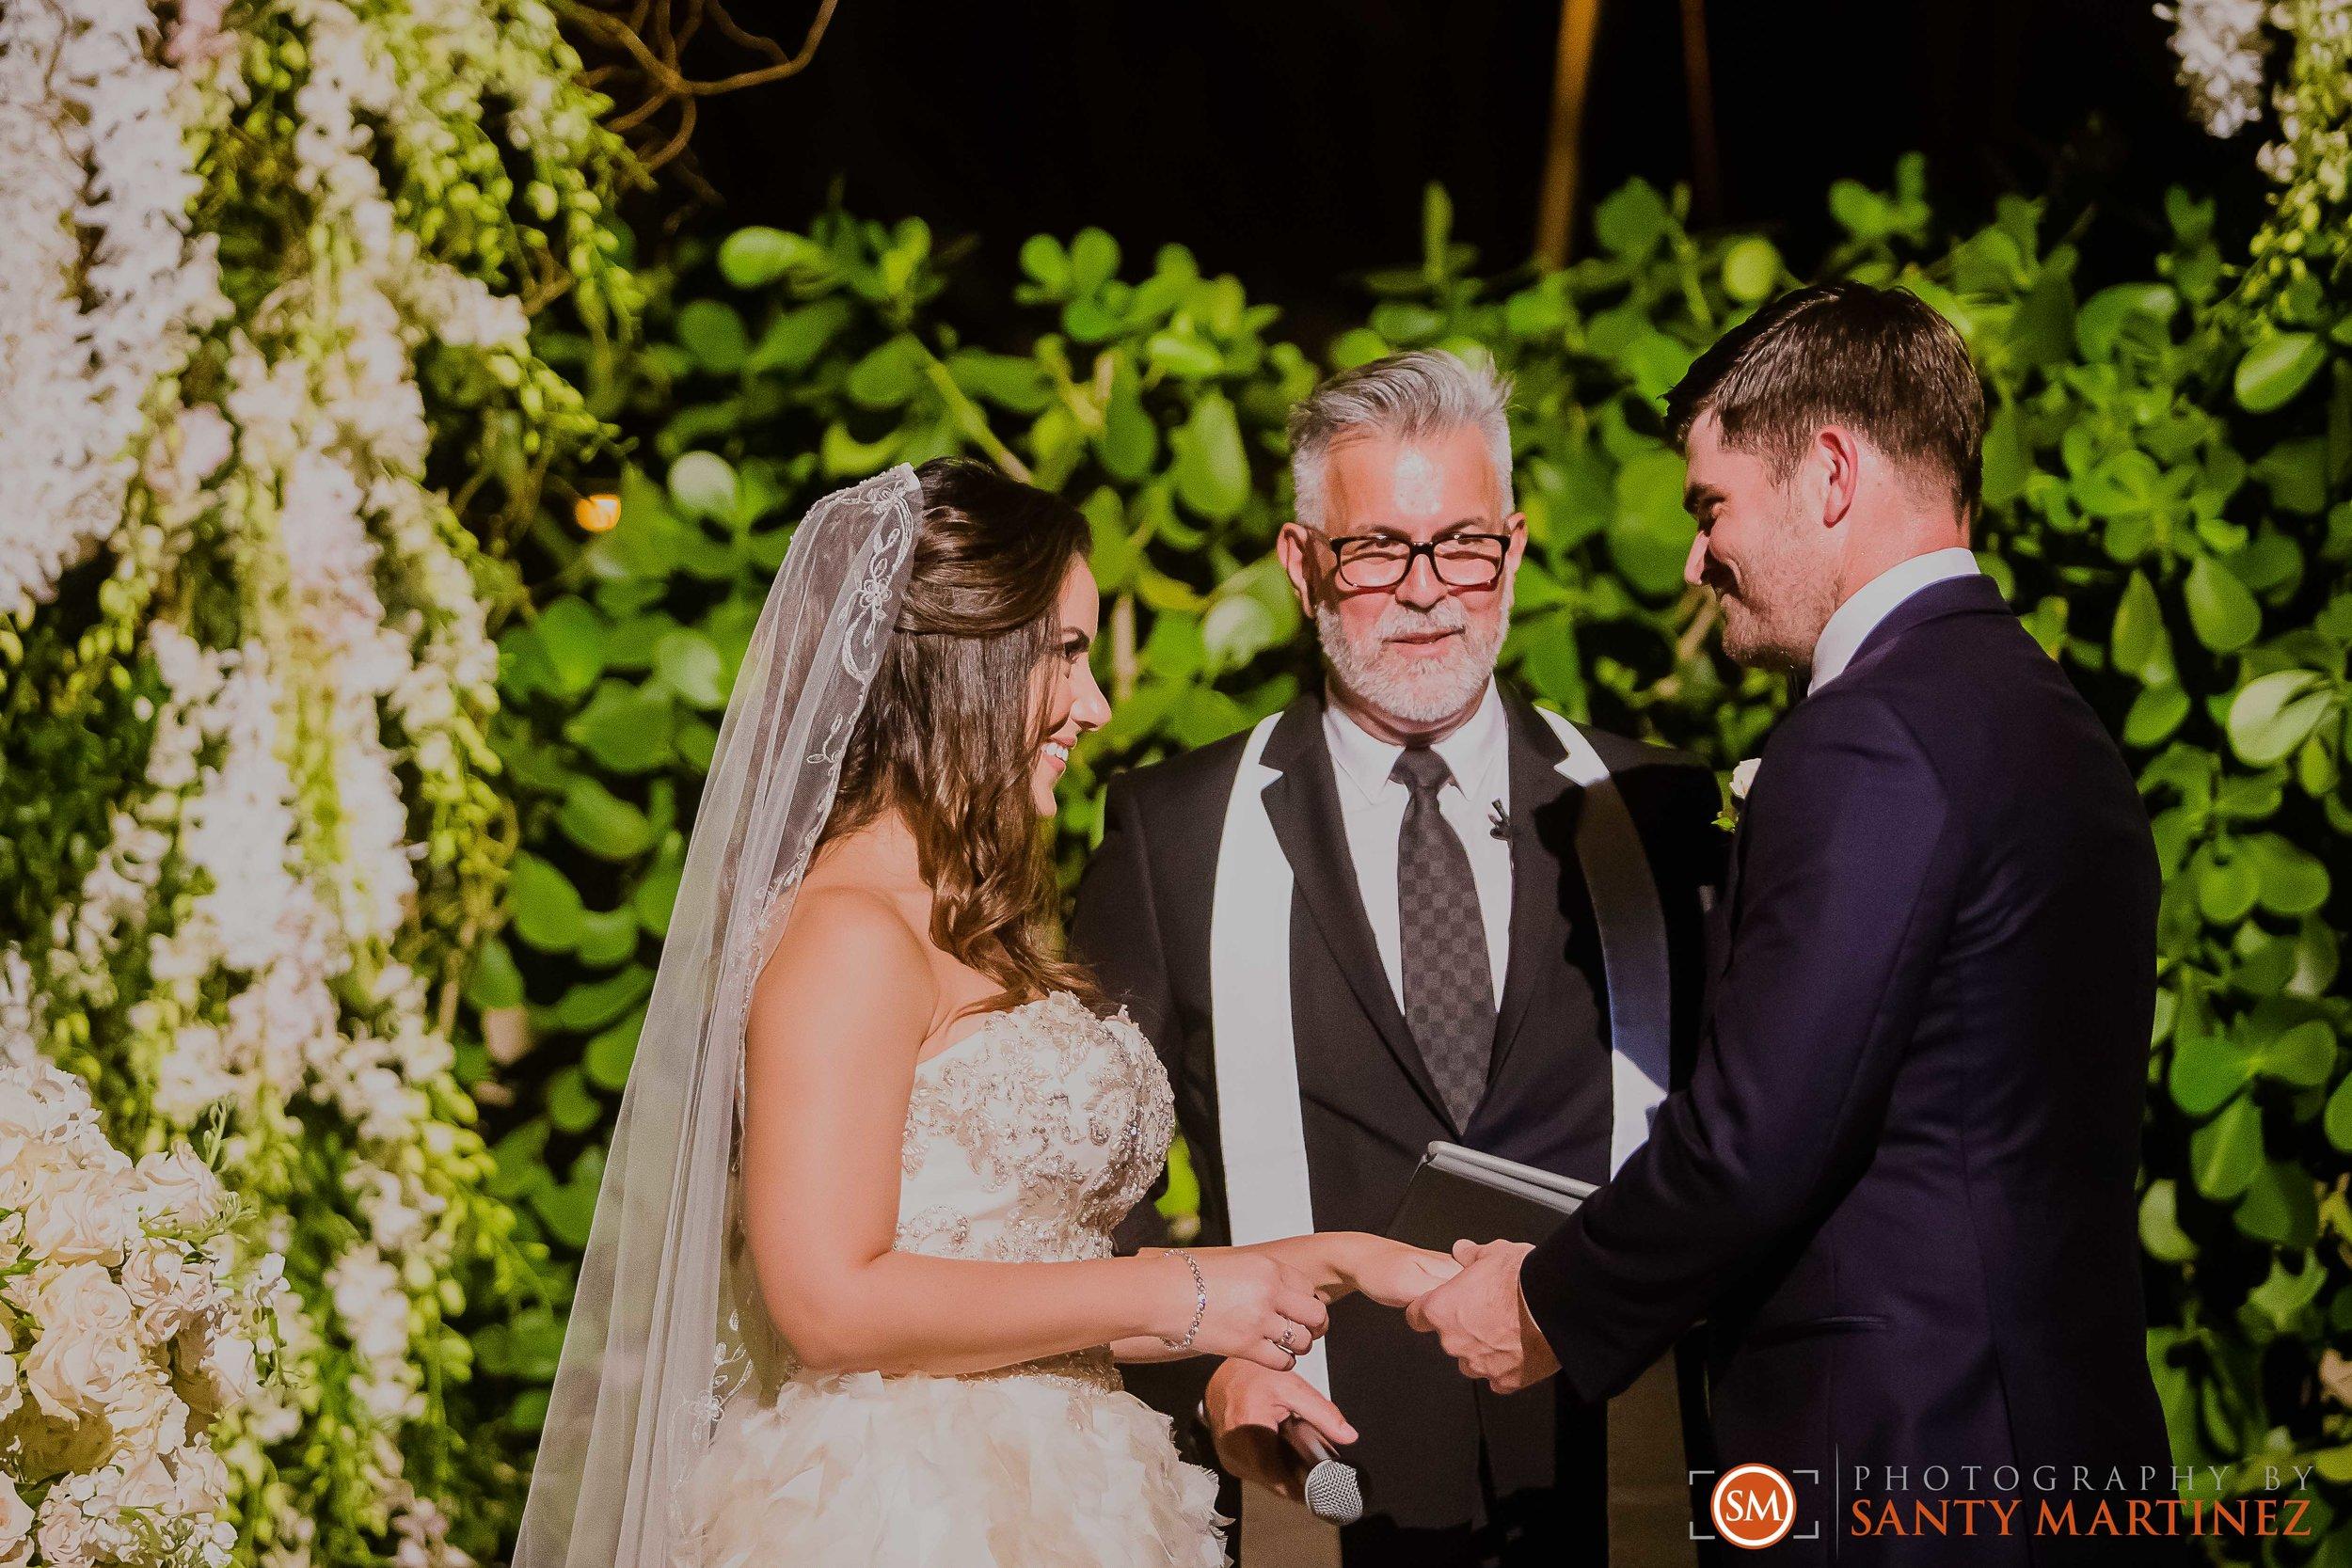 Wedding Coral Gables Country Club - Santy Martinez Photography-27.jpg